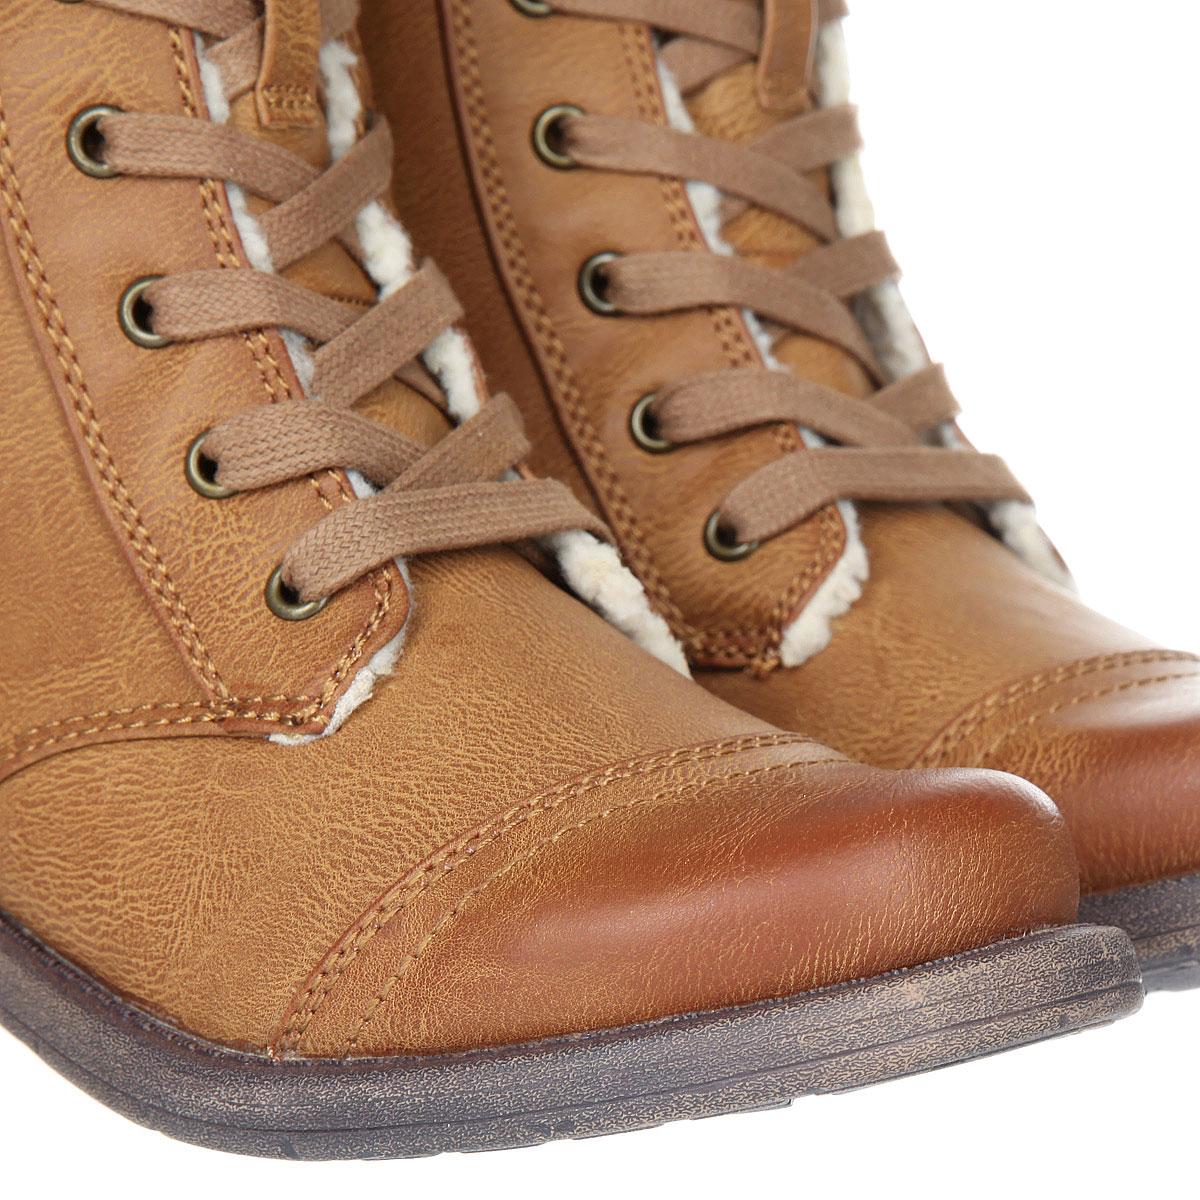 56da273007a6 Купить ботинки зимние женские Roxy Dominguez Boot Tan (ARJB700543 ...